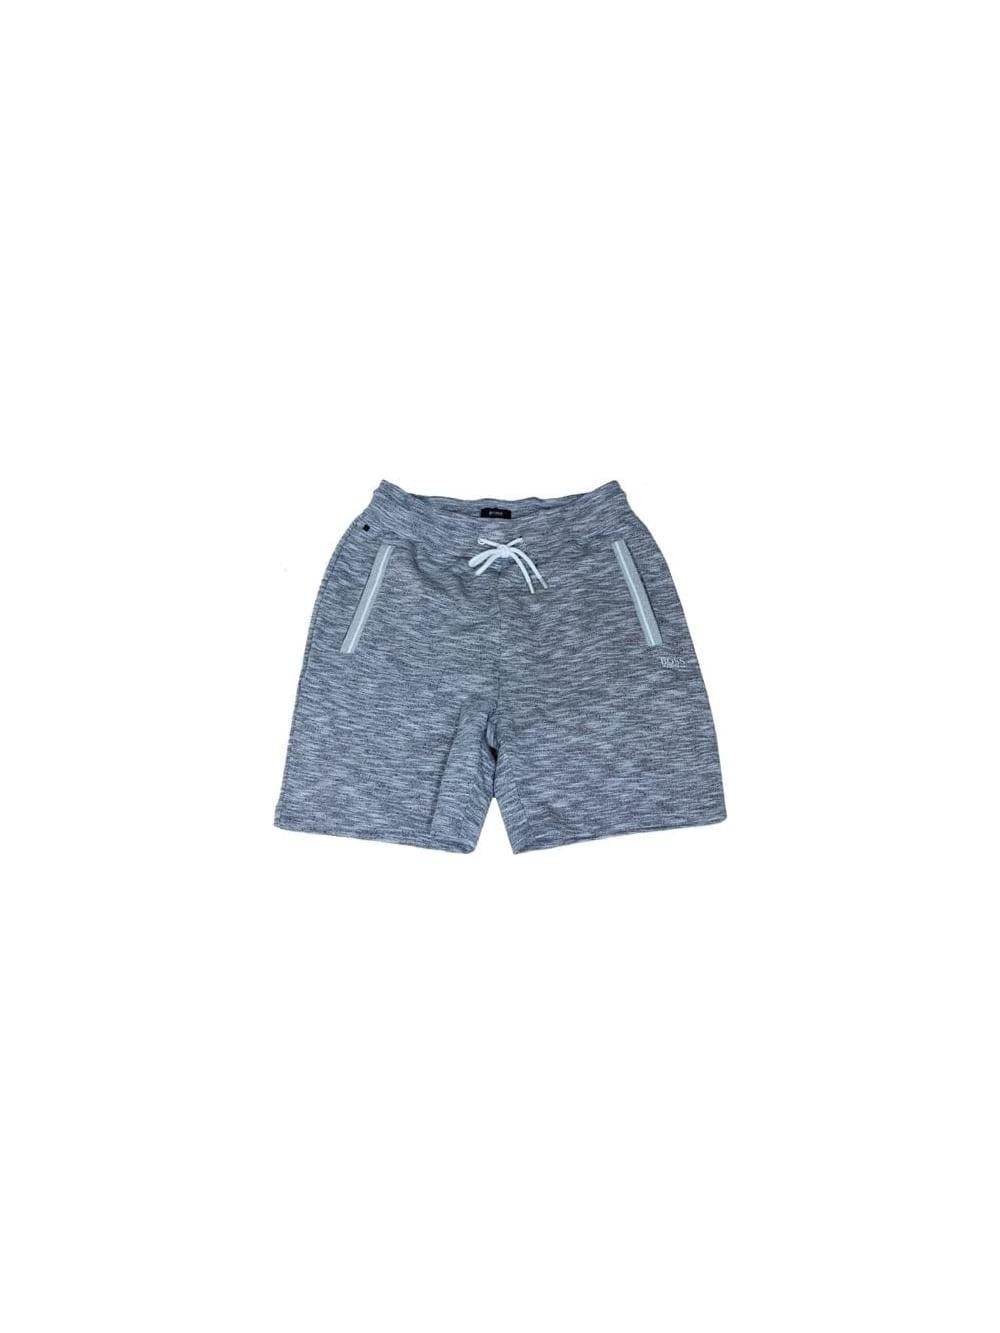 2b019ac91 Hugo Boss Black Short Sweat Pants in Medium Grey - Northern Threads